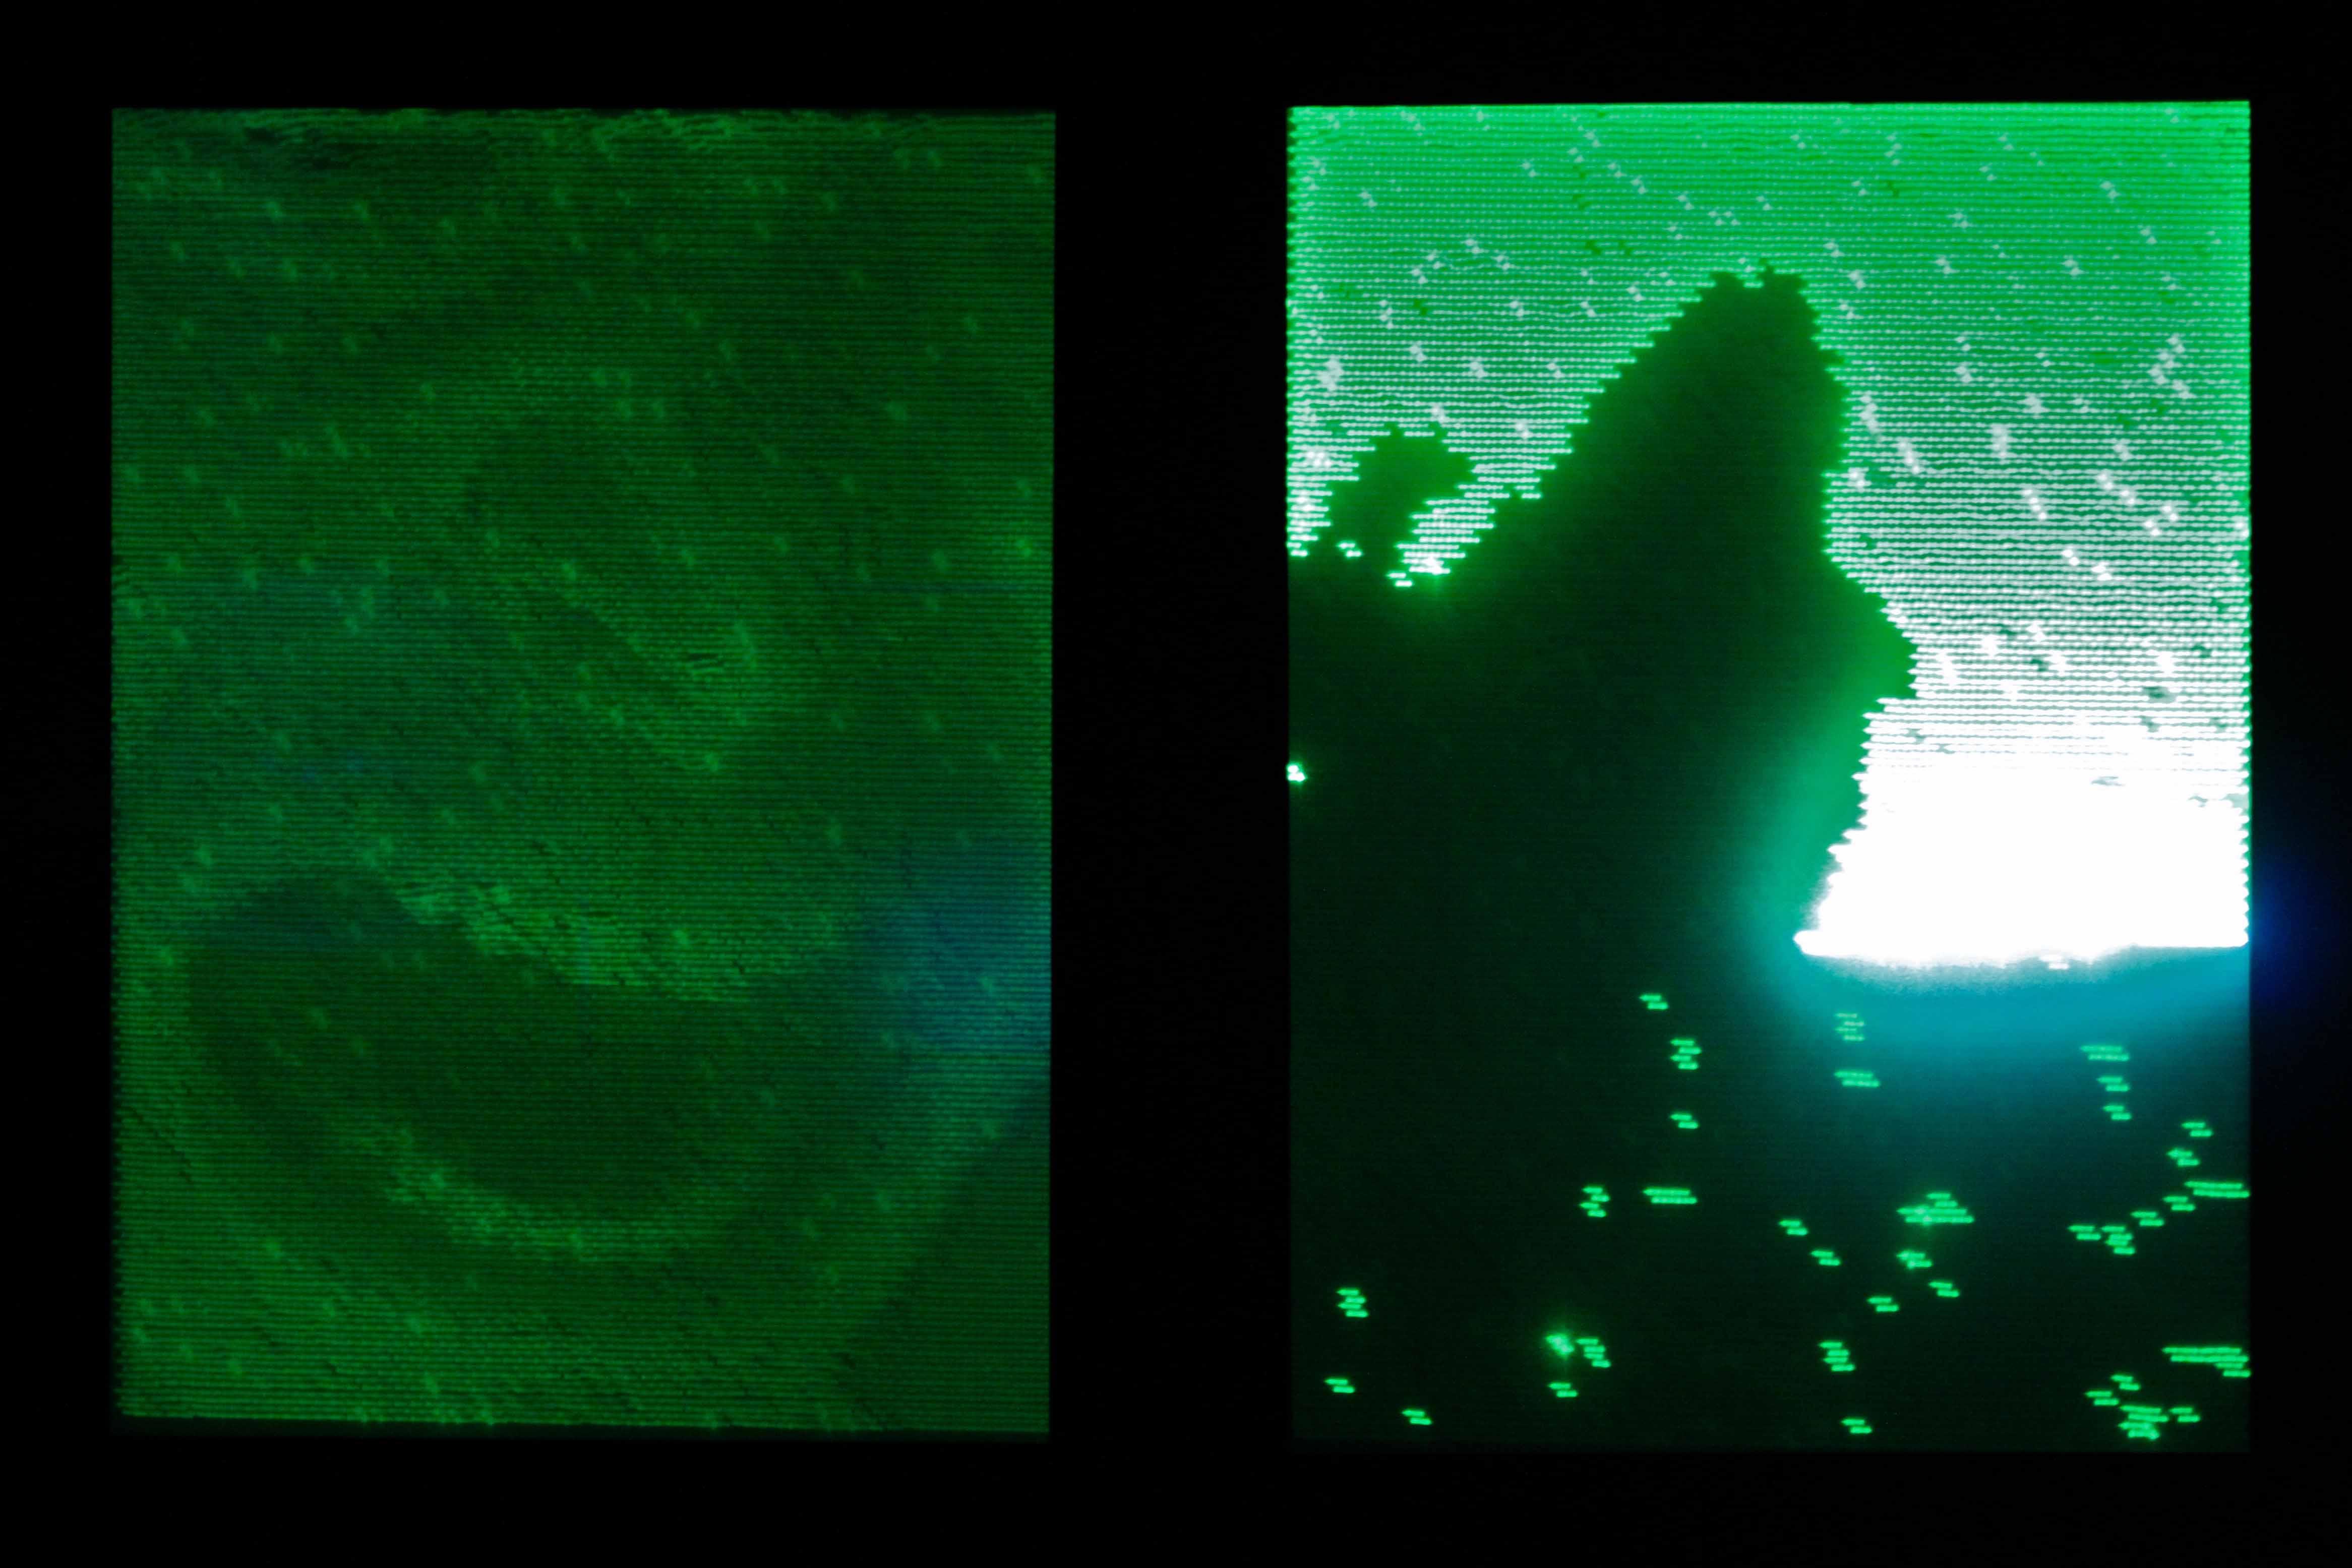 <i>UV Laser Fade Out</i> by Daito Manabe